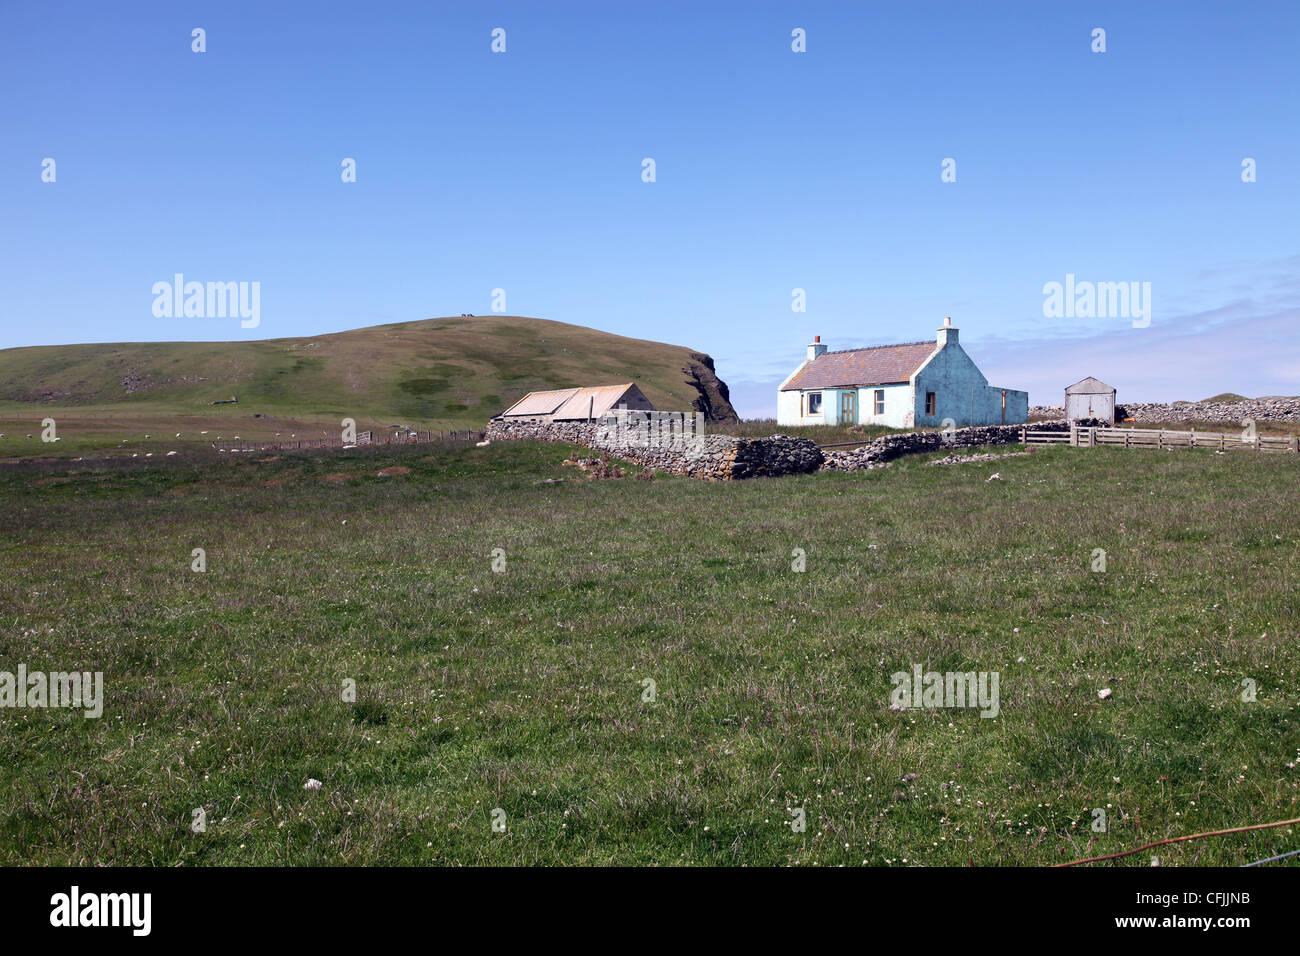 Croft, Fair Isle, Shetland, Scotland, United Kingdom, Europe - Stock Image